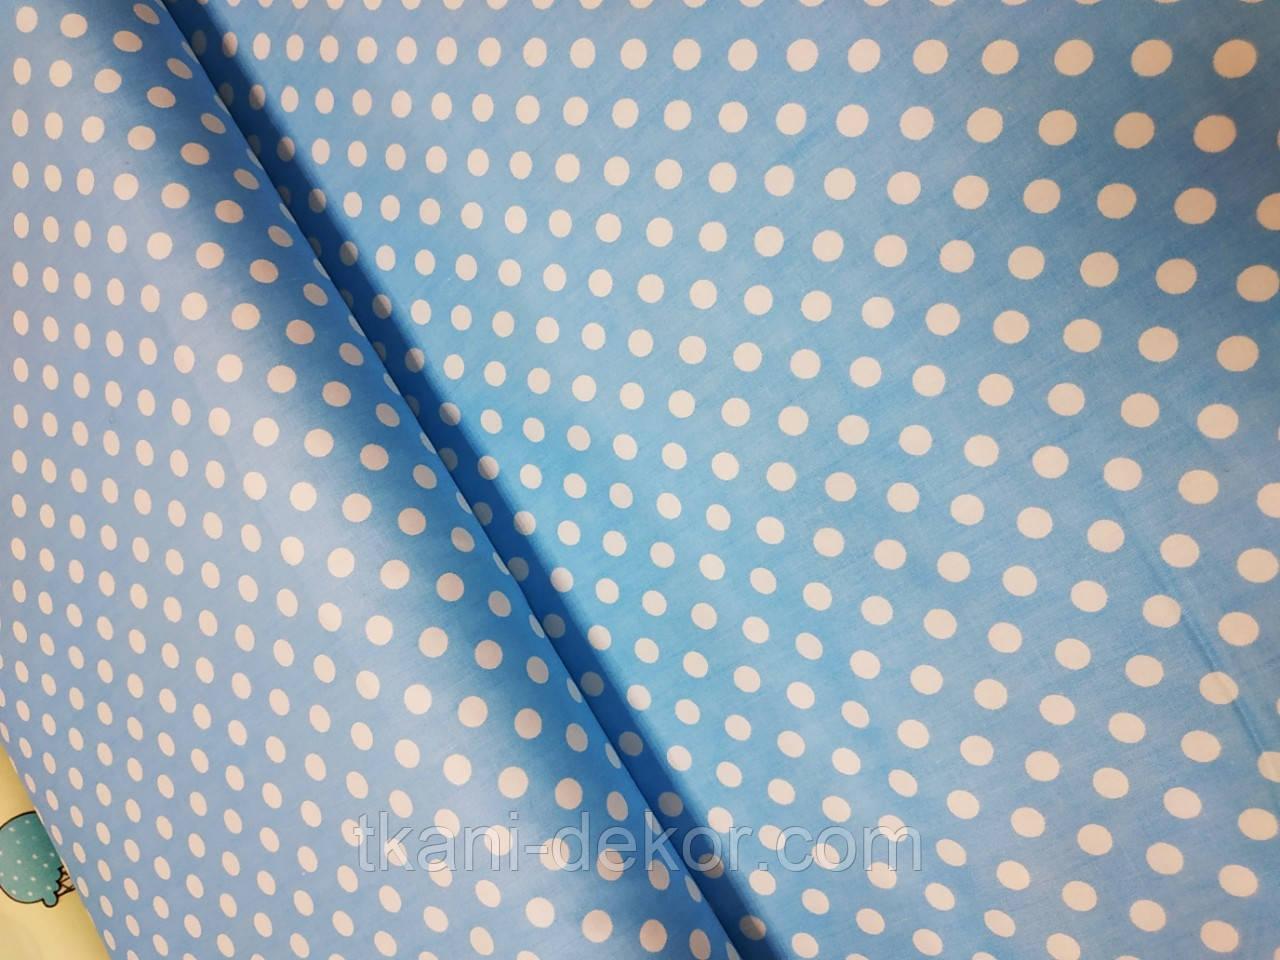 Сатин (хлопковая ткань) средний горох на голубом (компаньон к мороженкам)